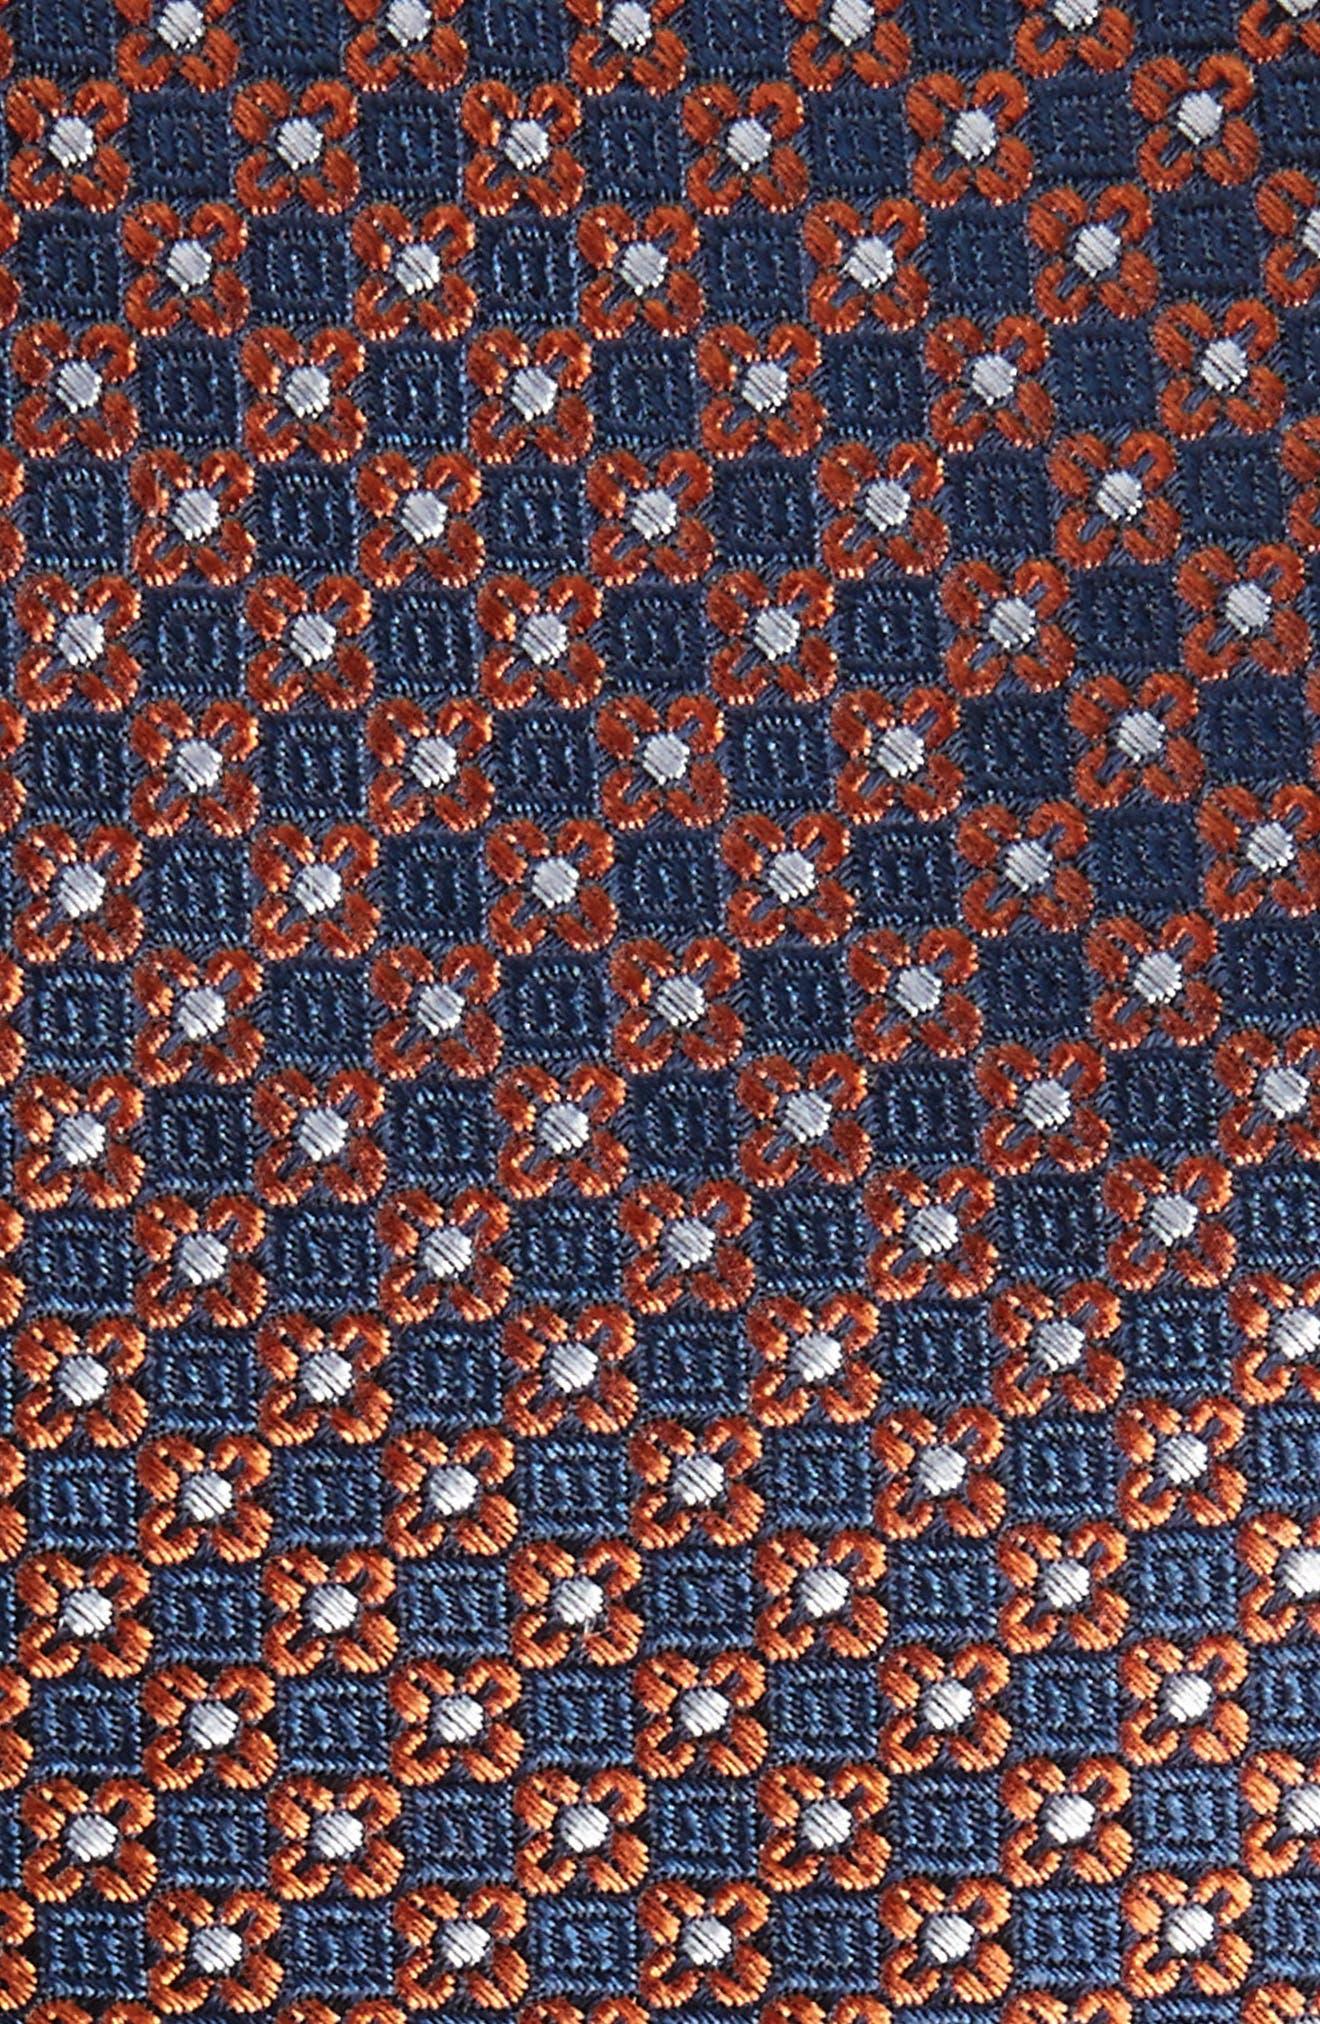 Floral Network Silk Skinny Tie,                             Alternate thumbnail 2, color,                             Orange